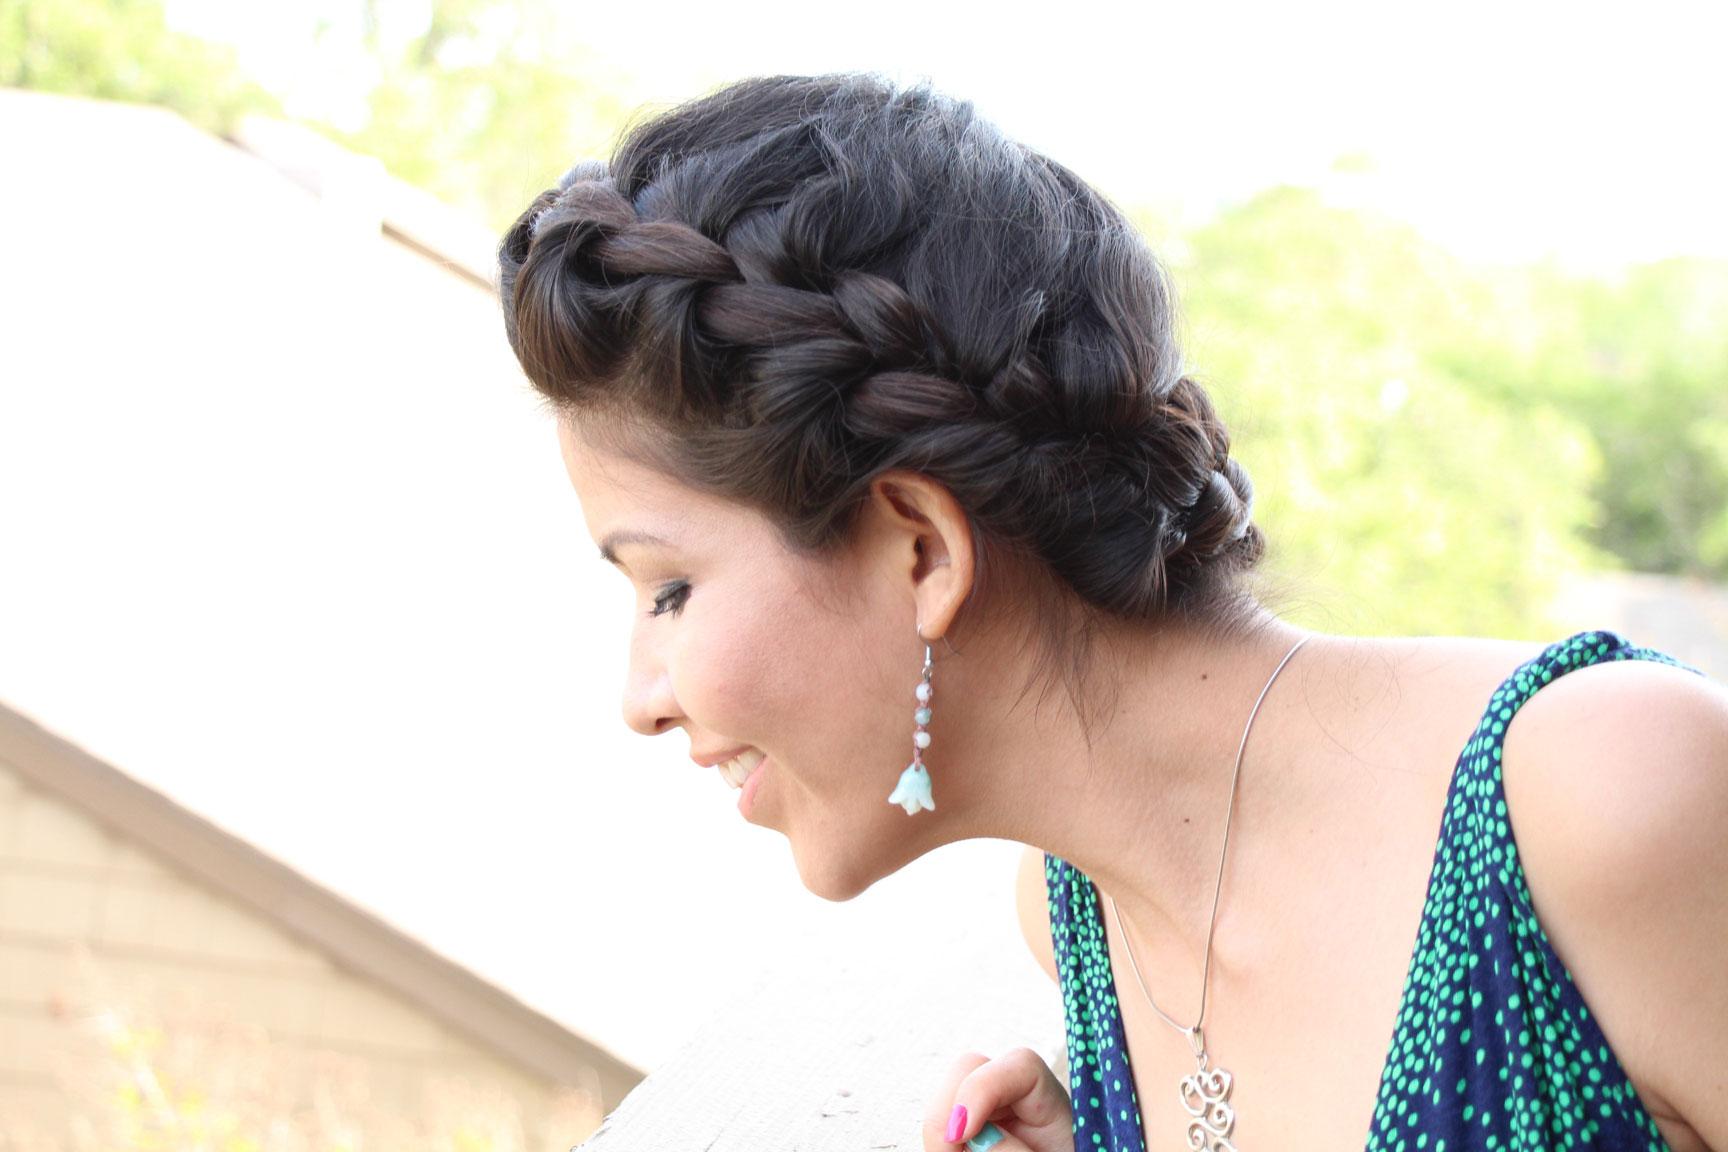 Hairstyles Halo Braid : cabello hair hairstyle halo braid peinados / hairstyles